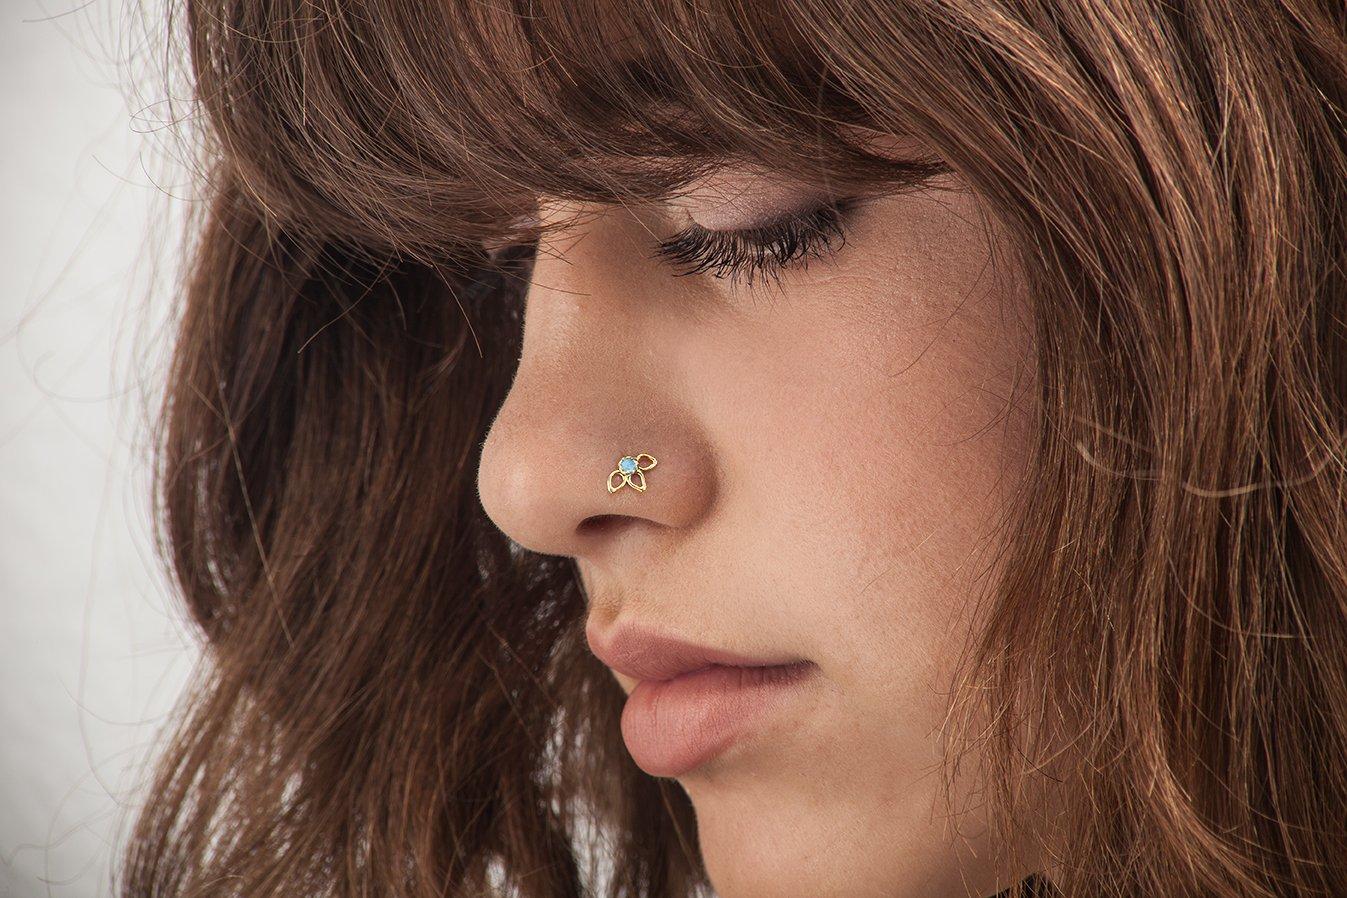 Studio Meme Handmade Enameled Nose Studs available in solid 14k Gold 20 Gauge